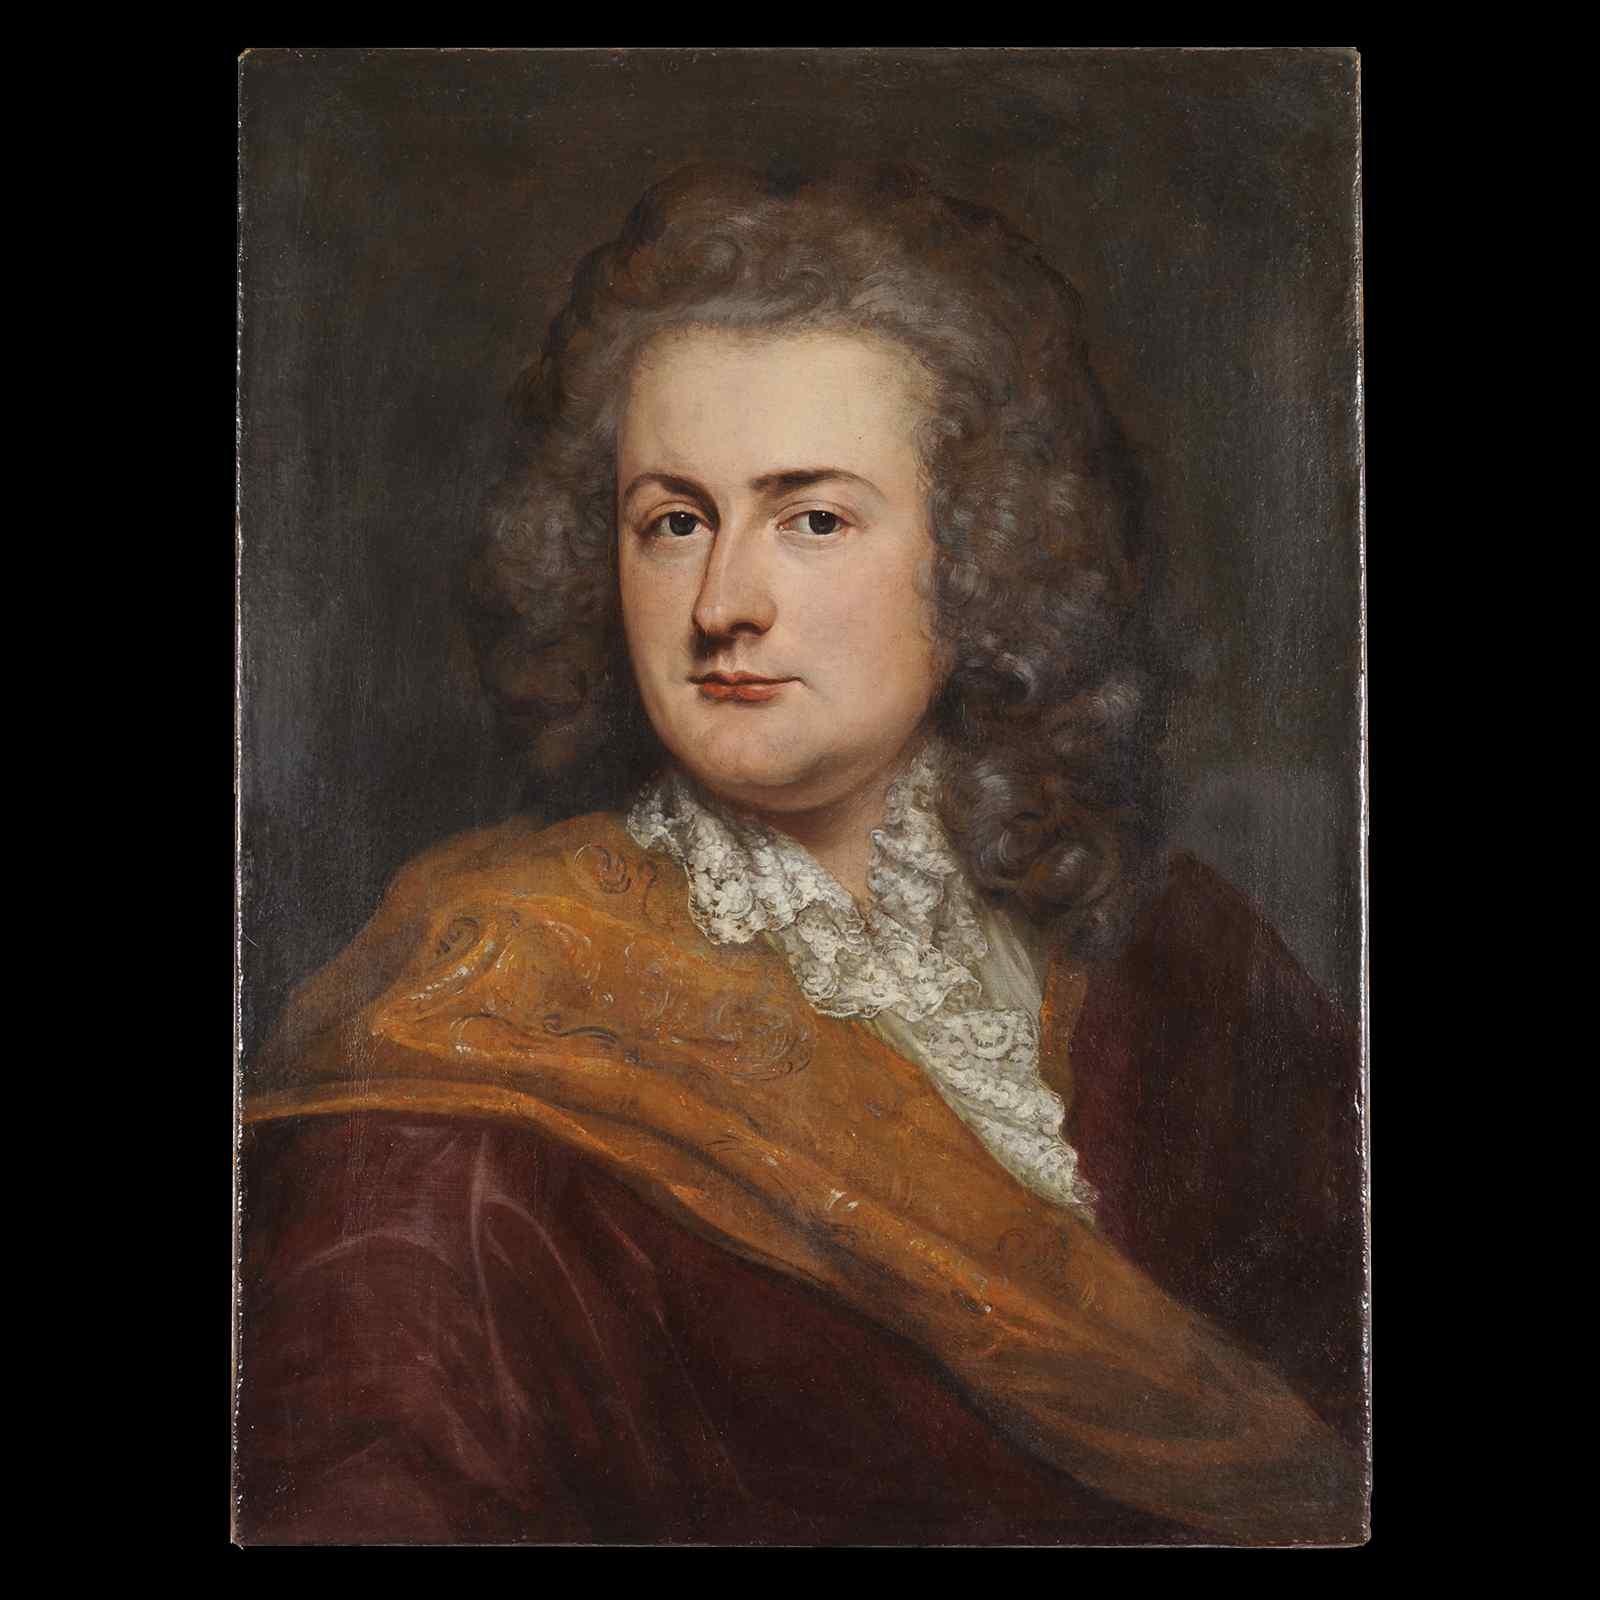 Portrait d'homme - Ecole anglaise XVIIIe